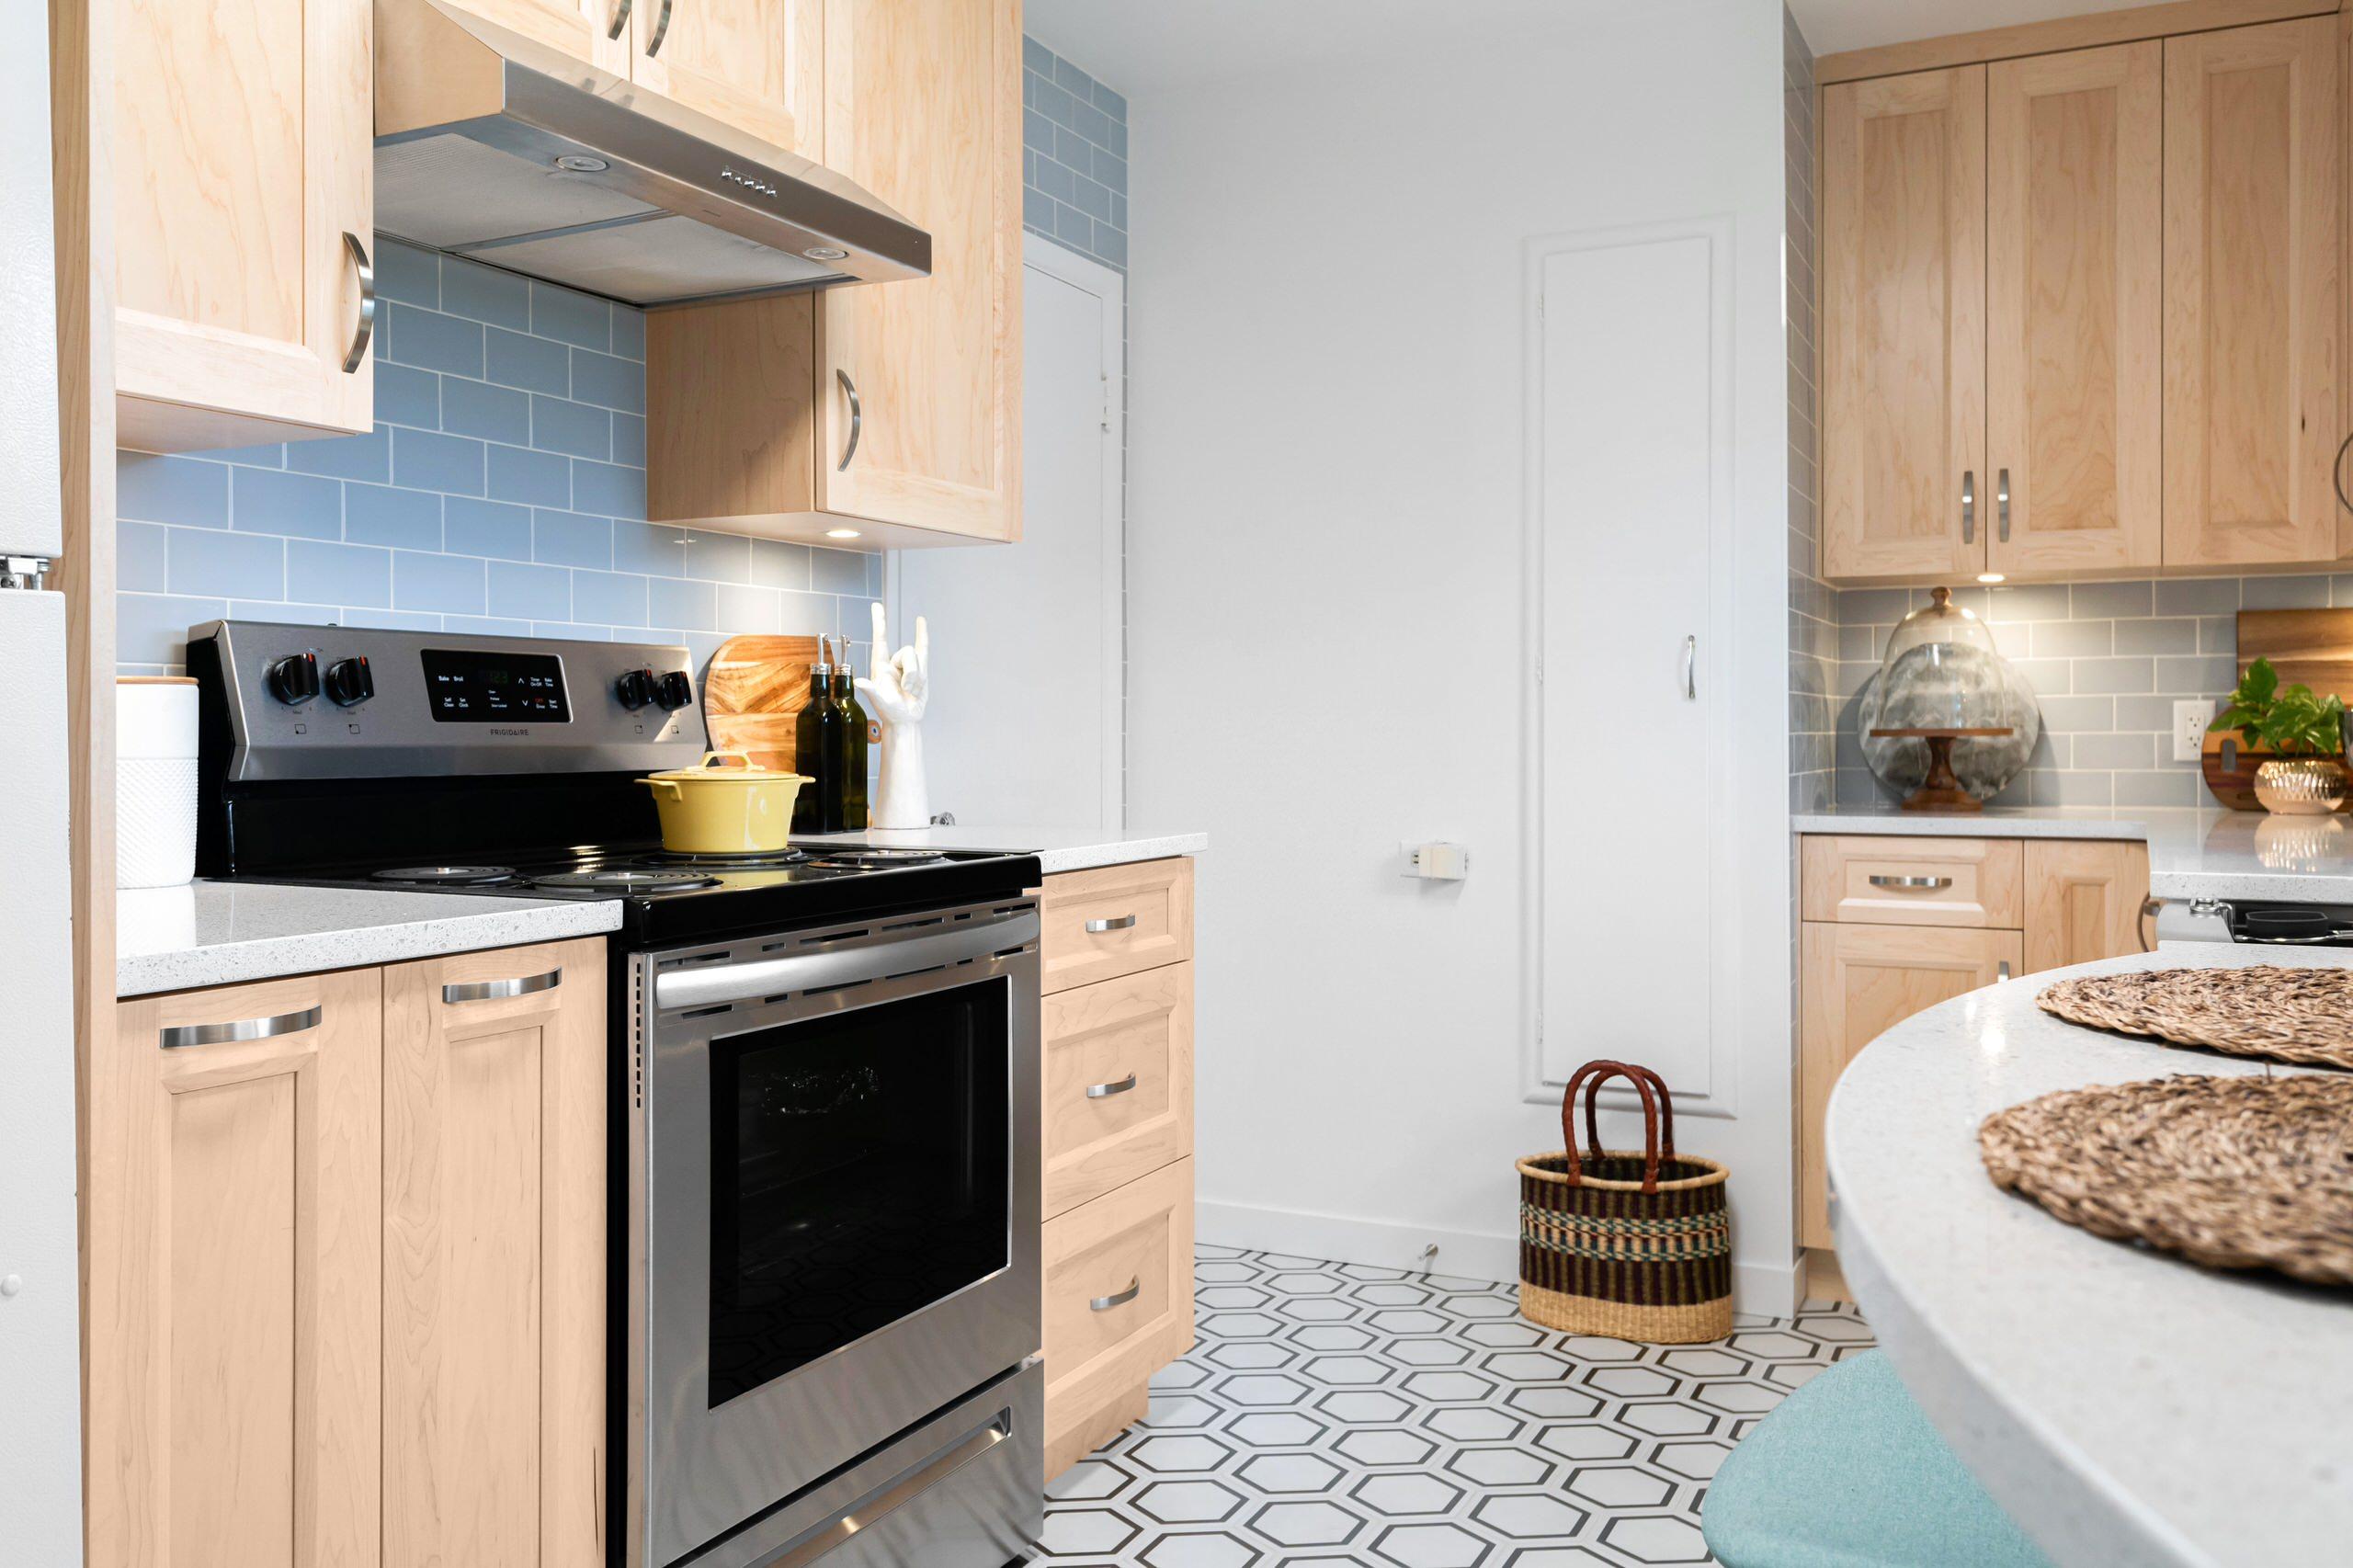 Charming 1950's Kitchen